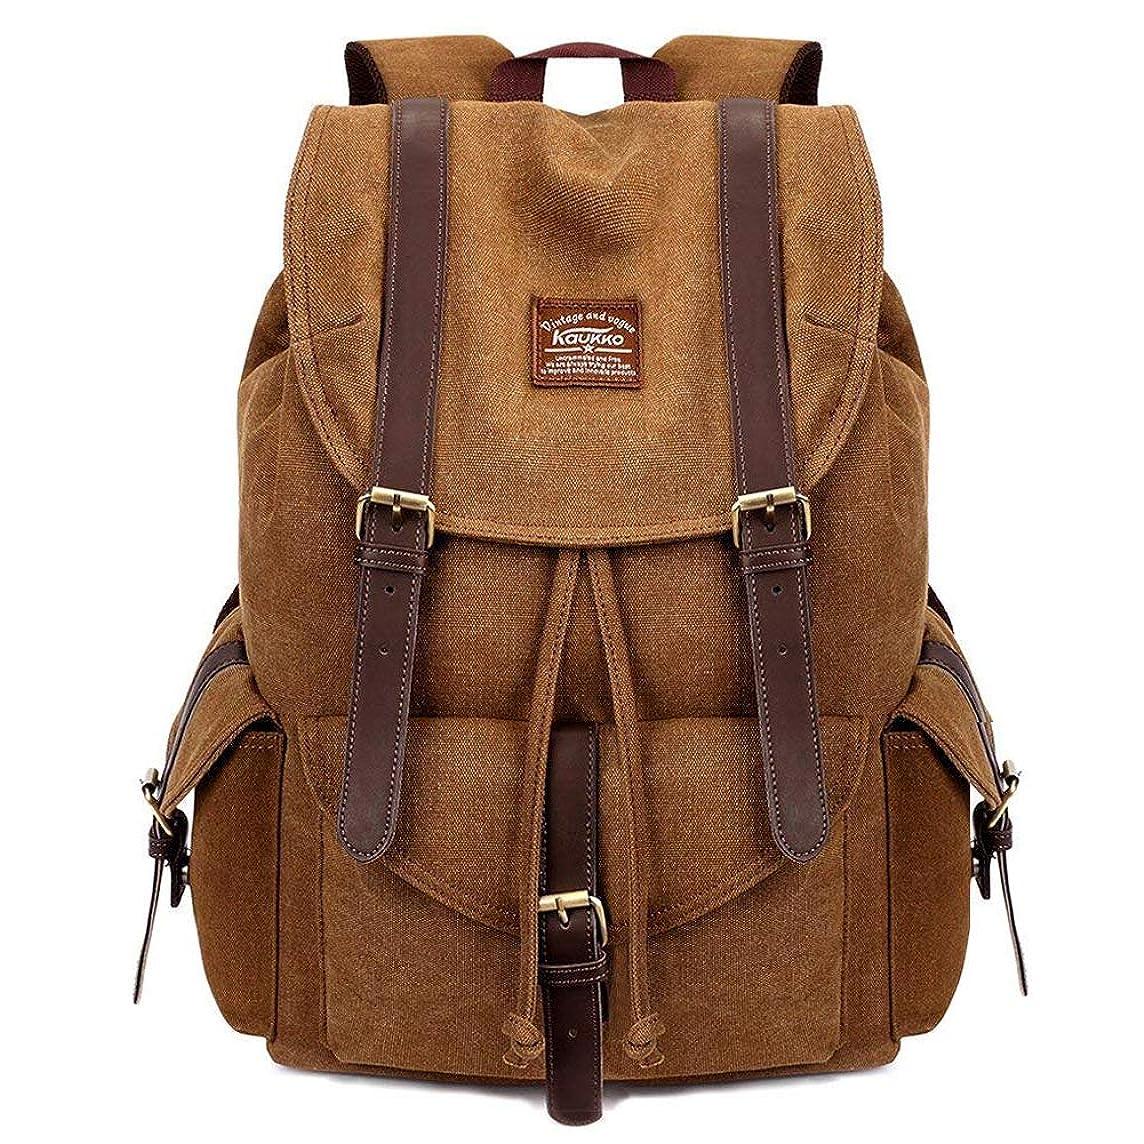 Vintage Canvas Backpack Kaukko Outdoor Travel Hiking Rucksack School Bookbags